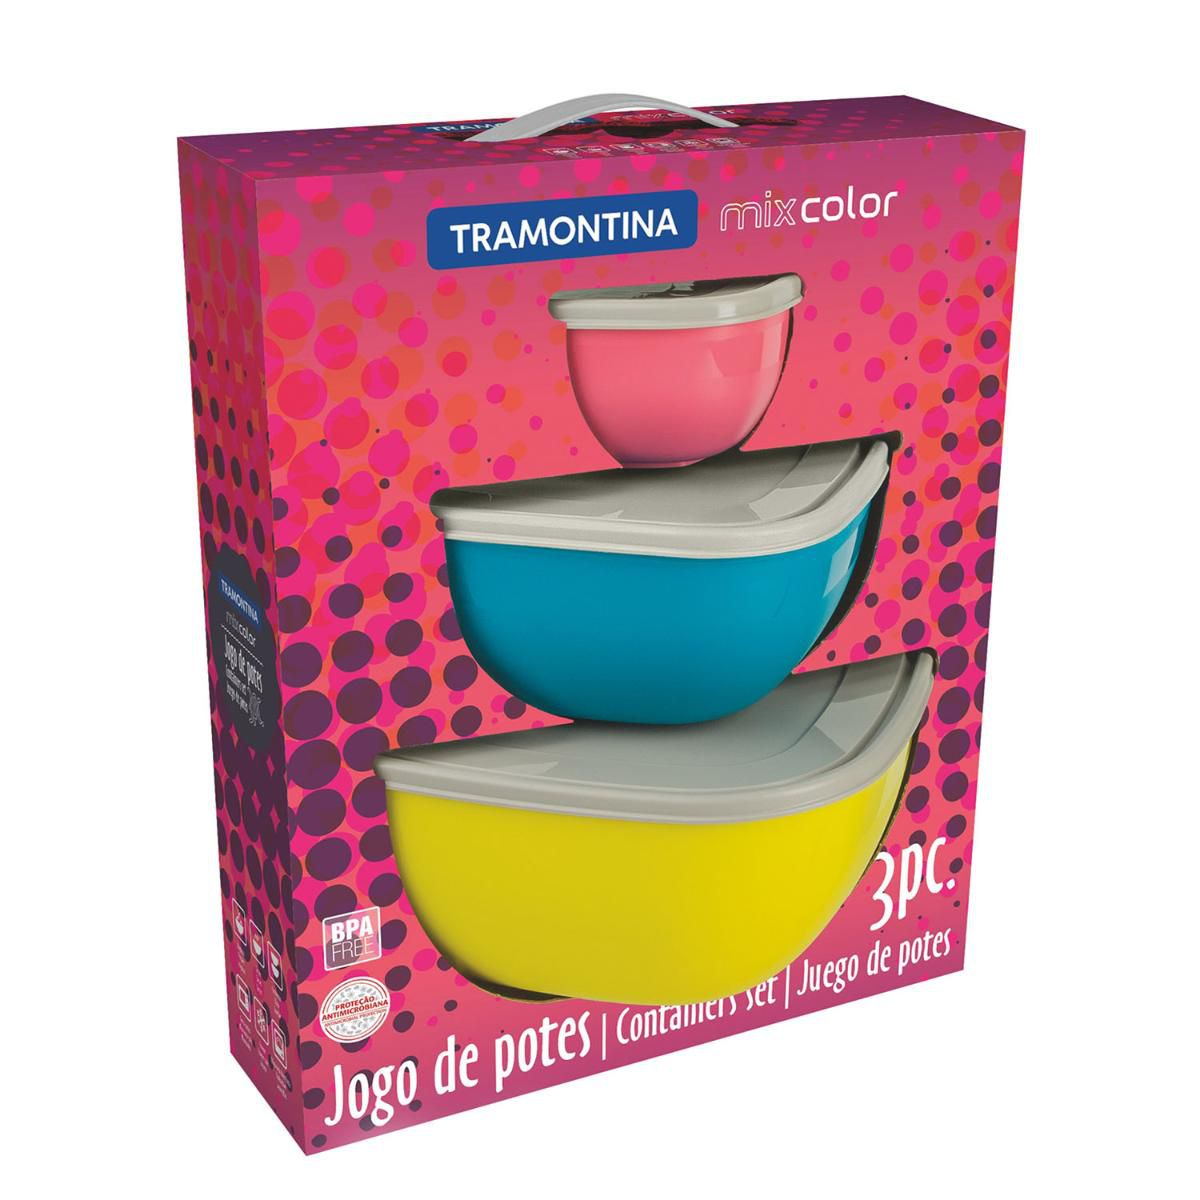 Conjunto De Potes 3 Peças Mixcolor 25099953 Tramontina